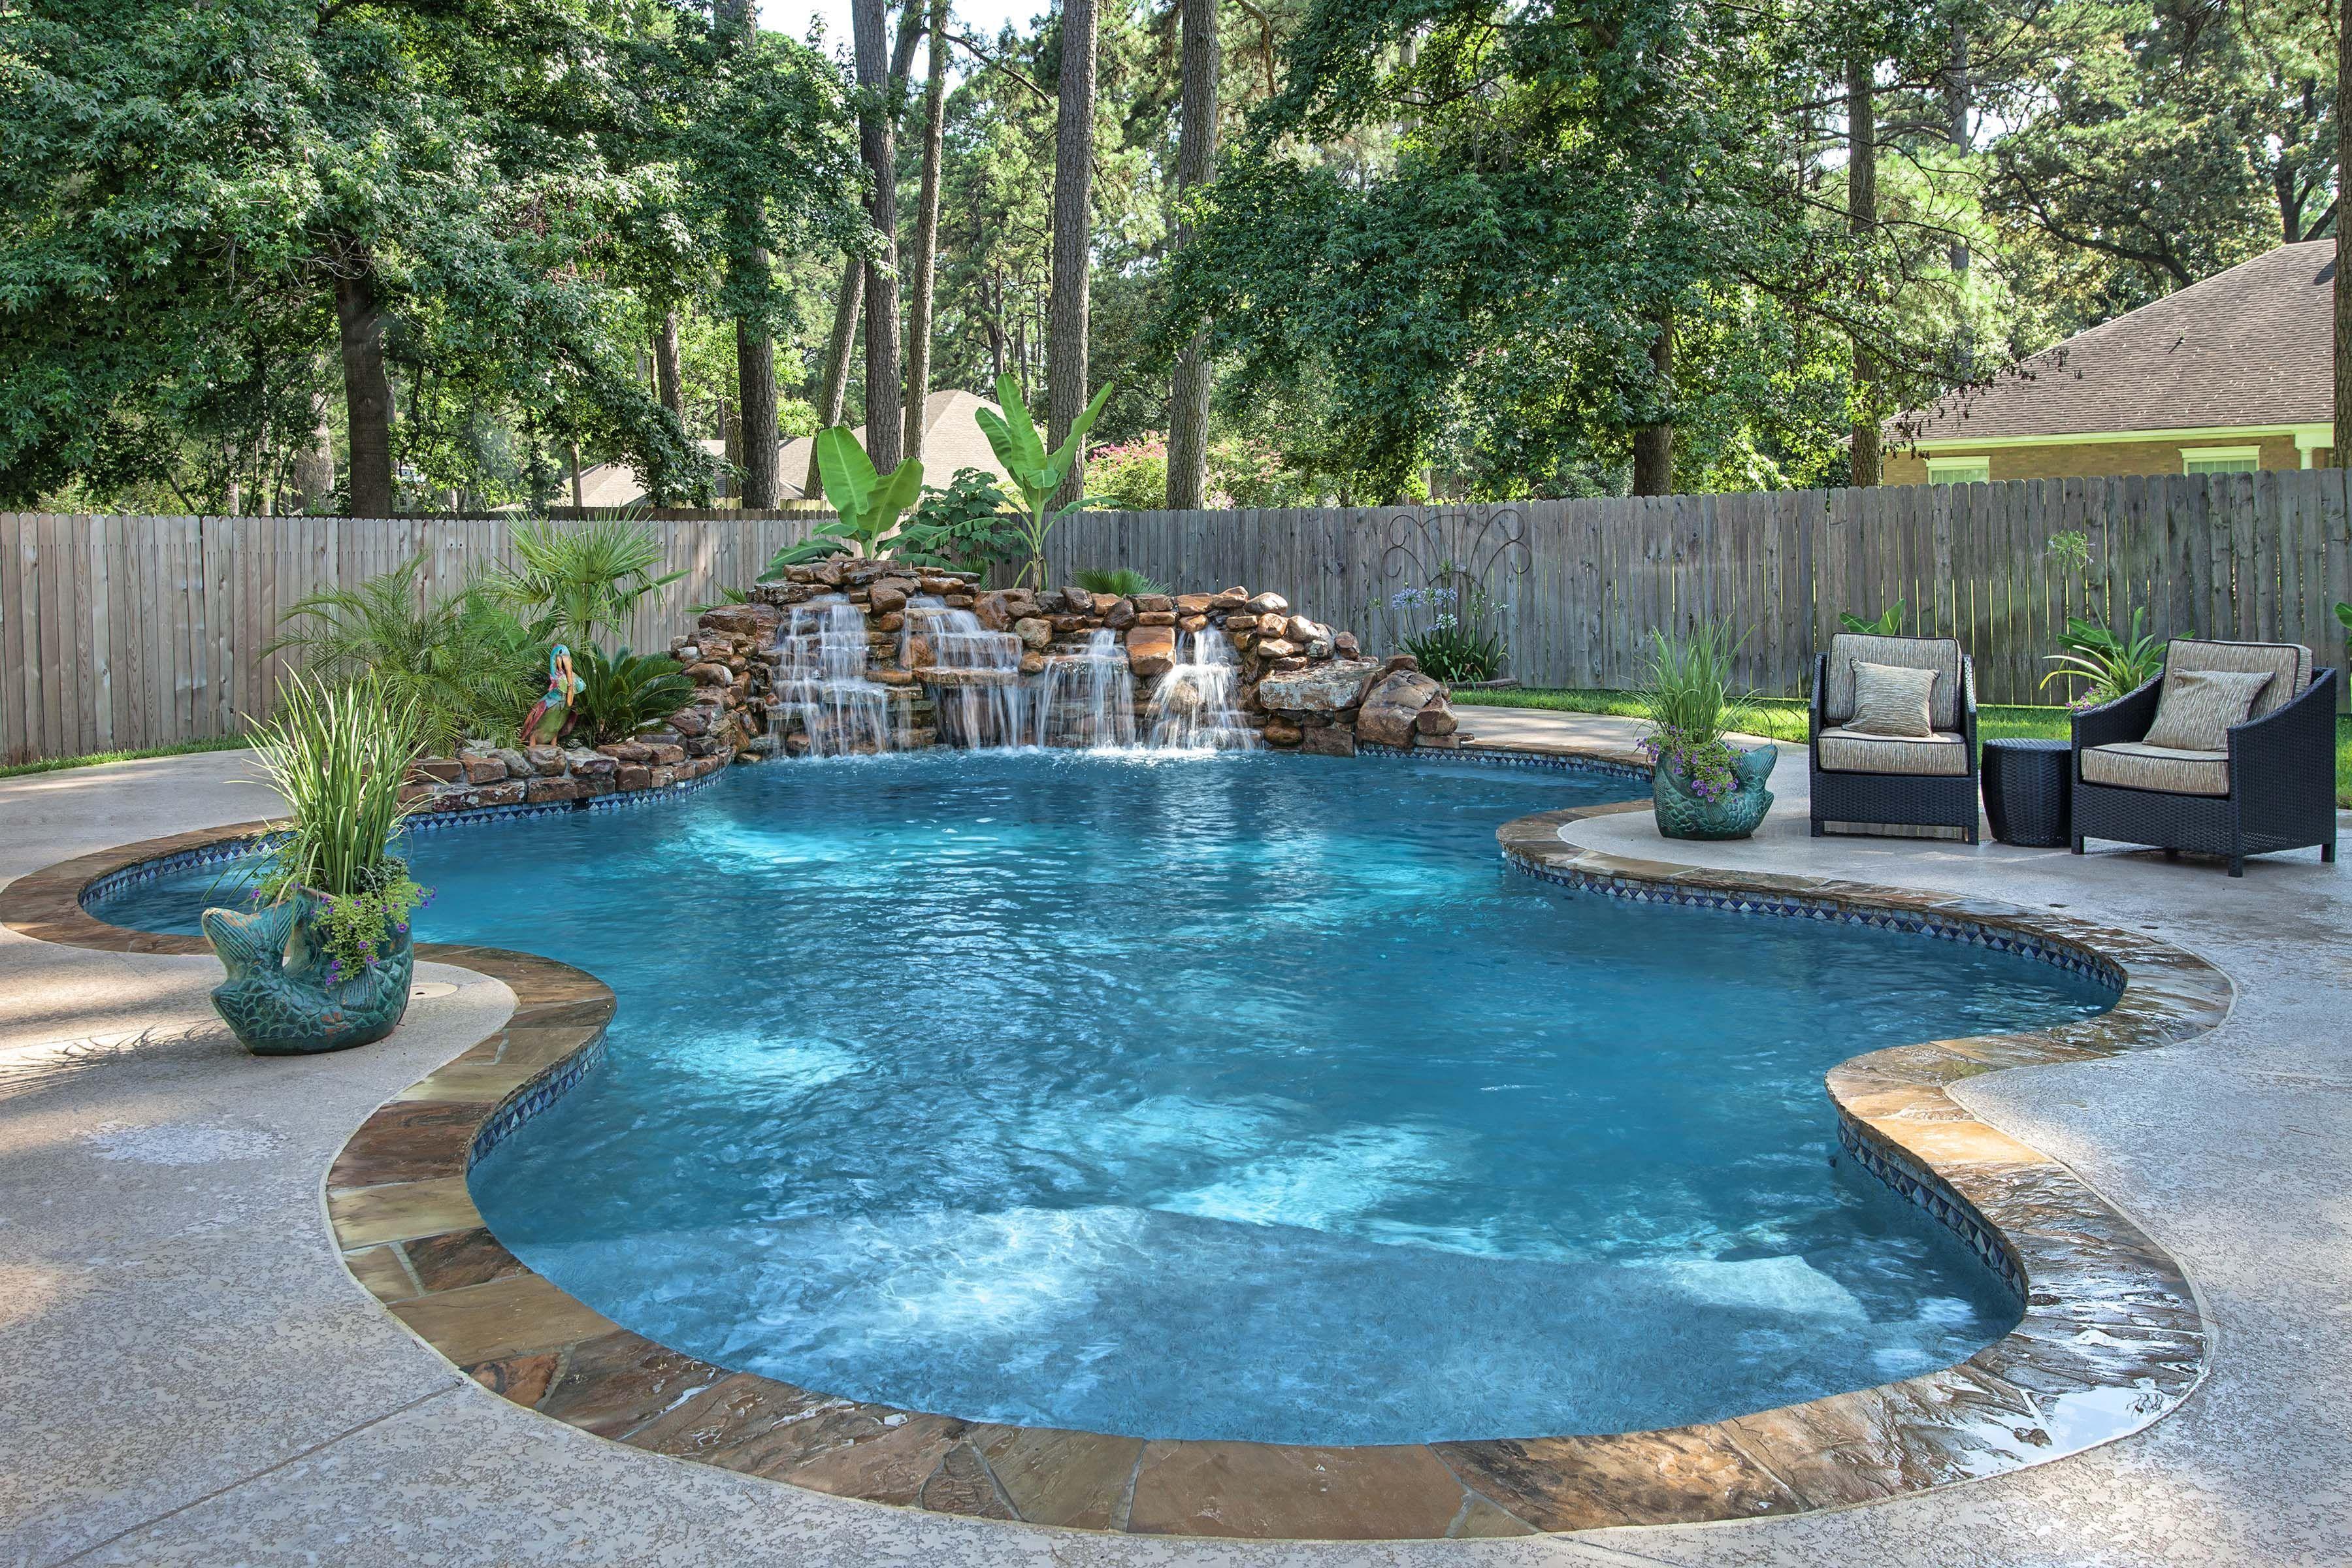 101 amazing backyard pool ideas back yard ideas pool for Pool design 101